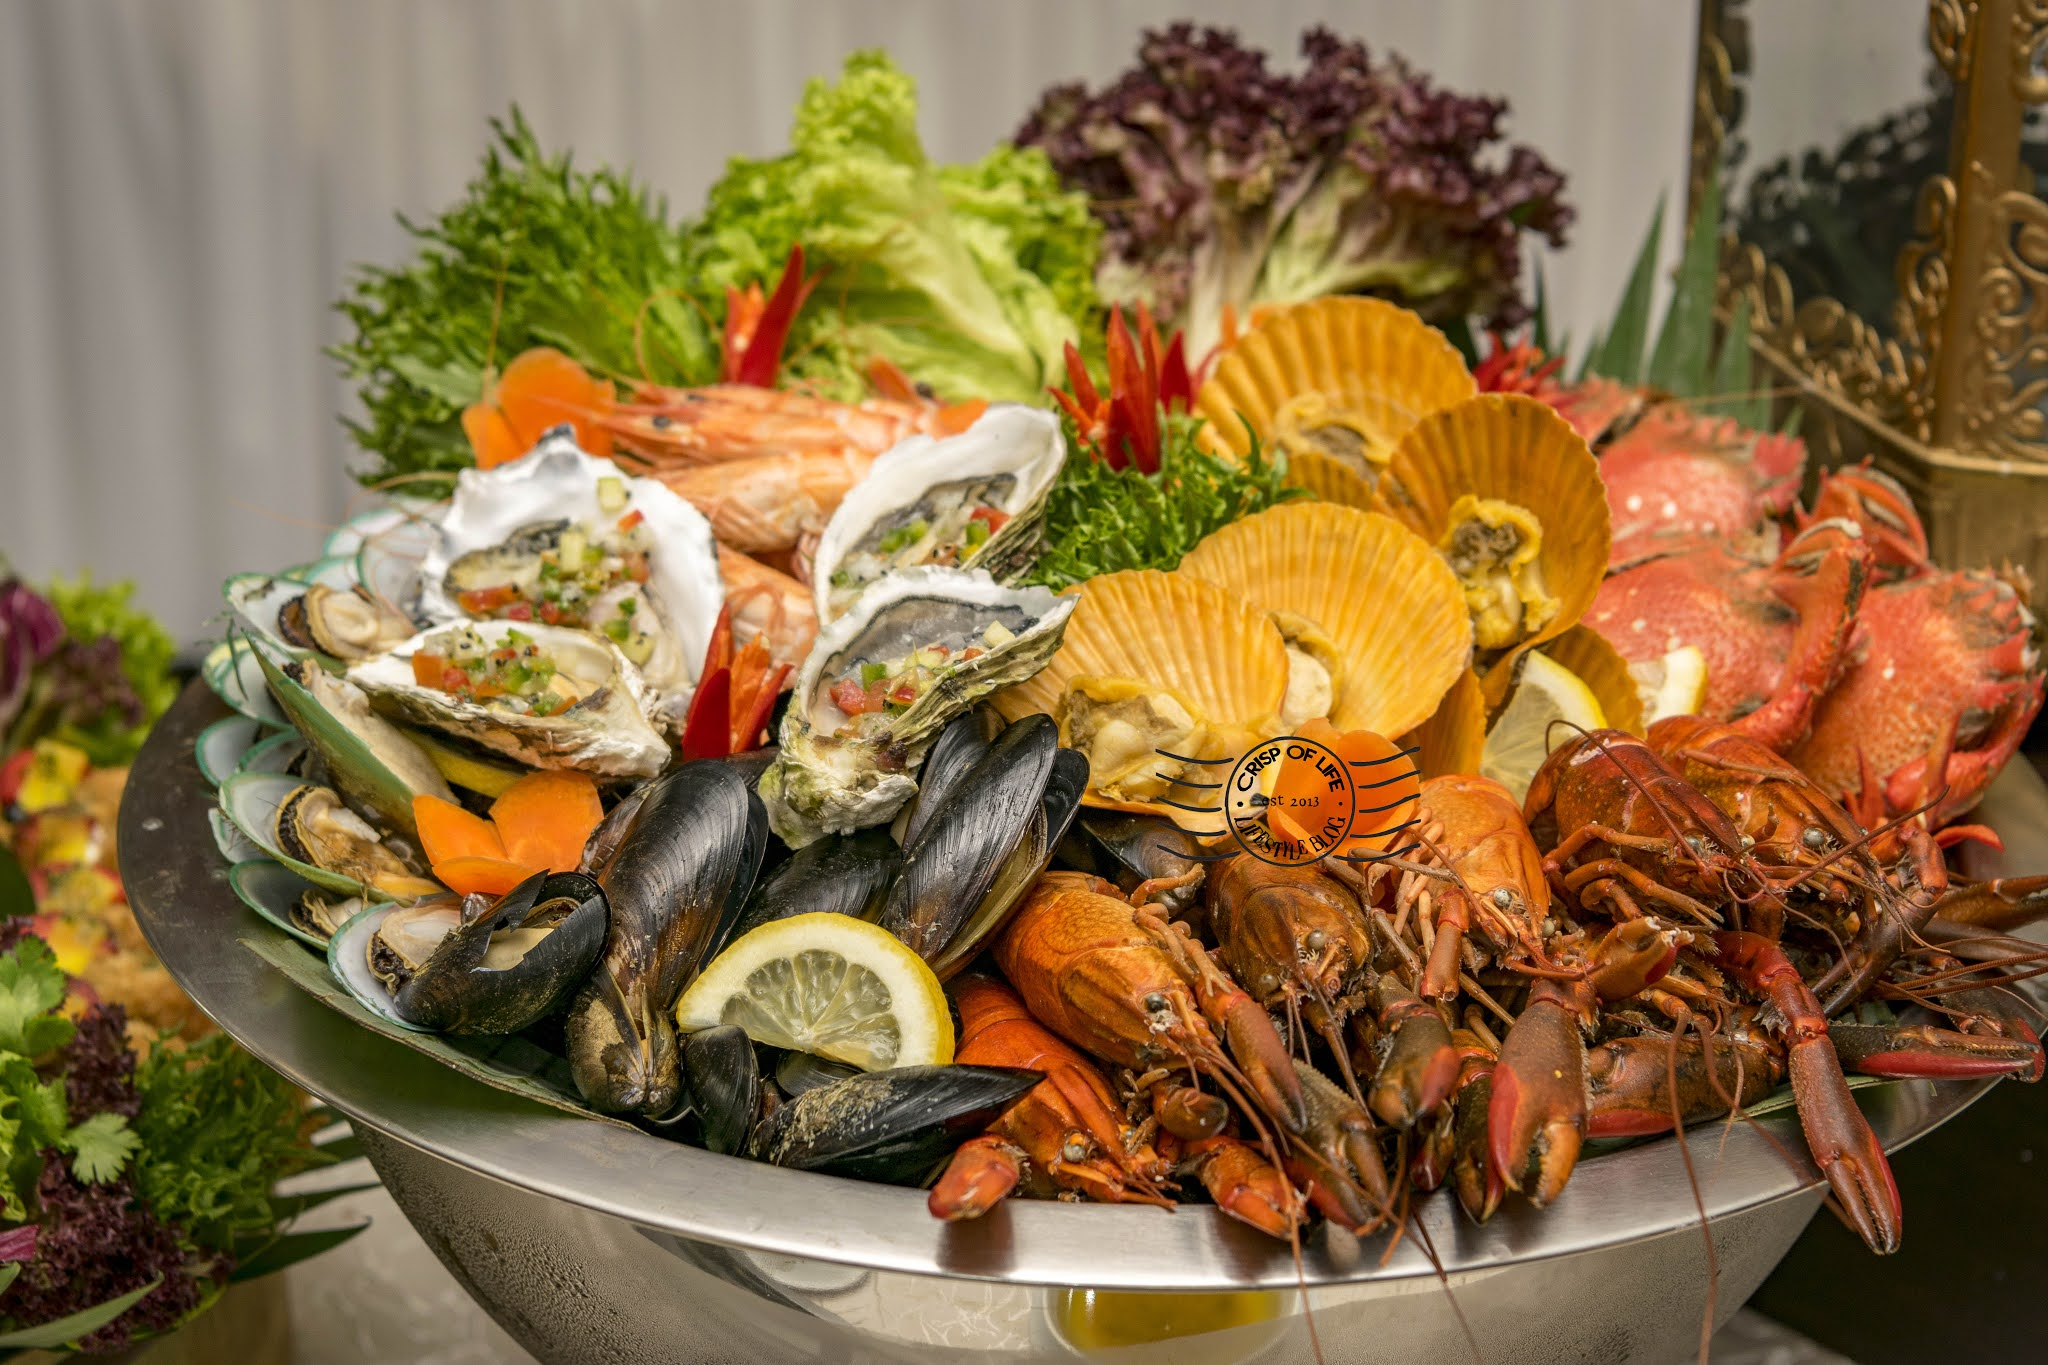 Arabian Nights Unlimited A La Carte Dinner @ Sarkies, Eastern & Oriental Hotel From 16 April - 11 May 2021